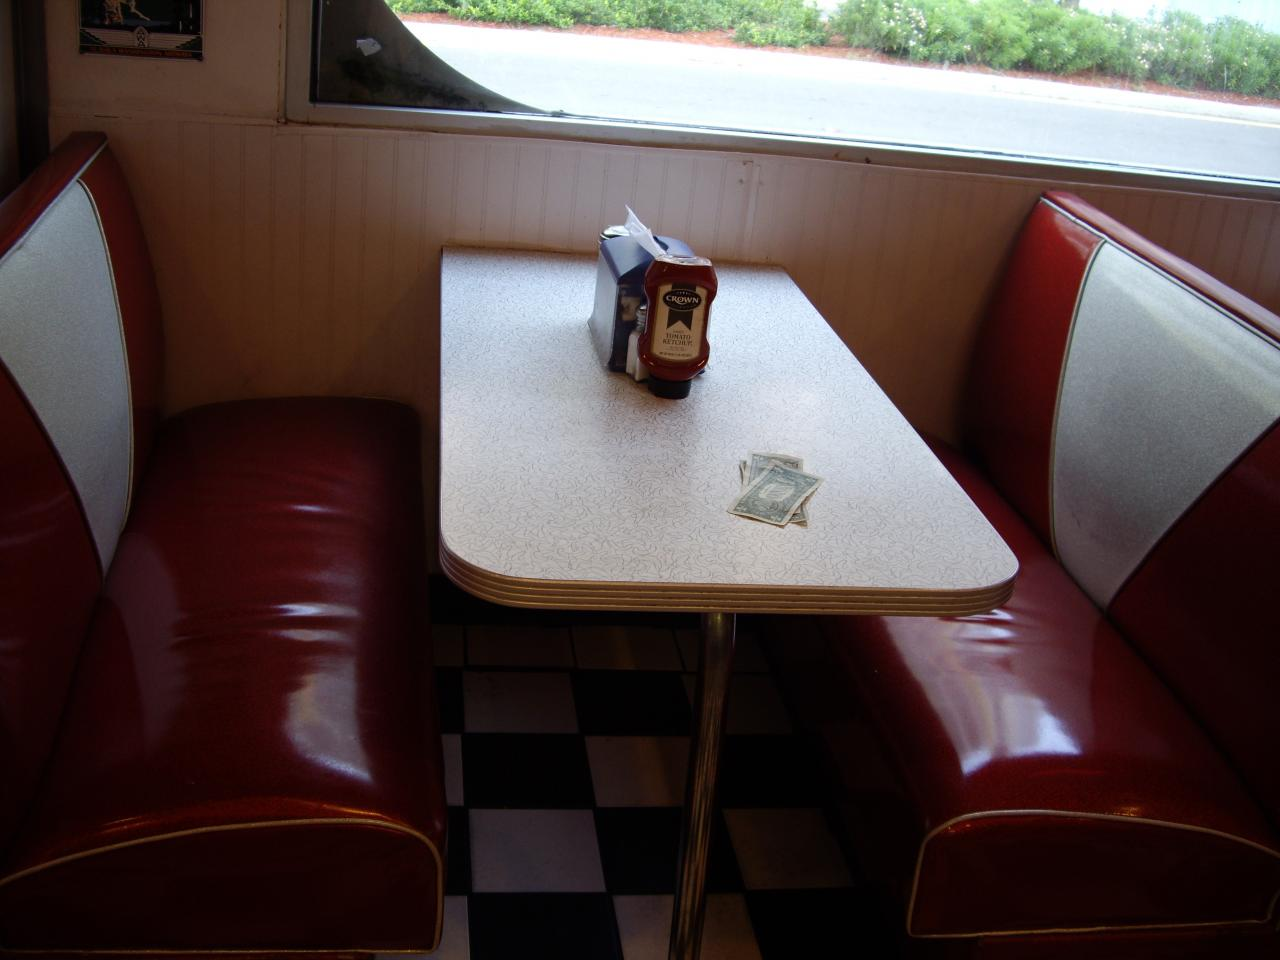 Diner Daytona Brunoricaine